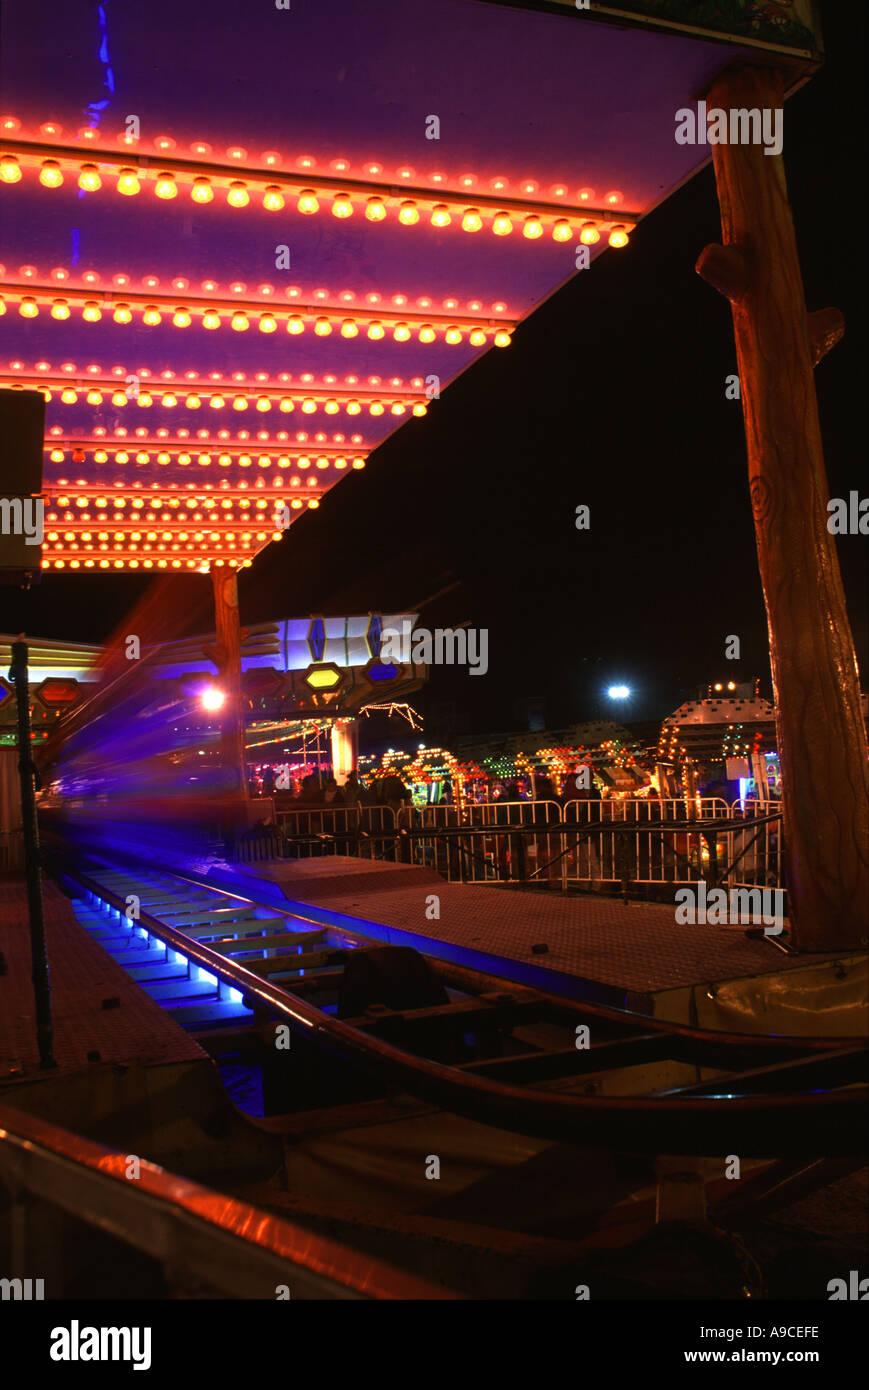 FAIRGROUND OAXACA STATE full horizontal colour SUNSET NEON ...